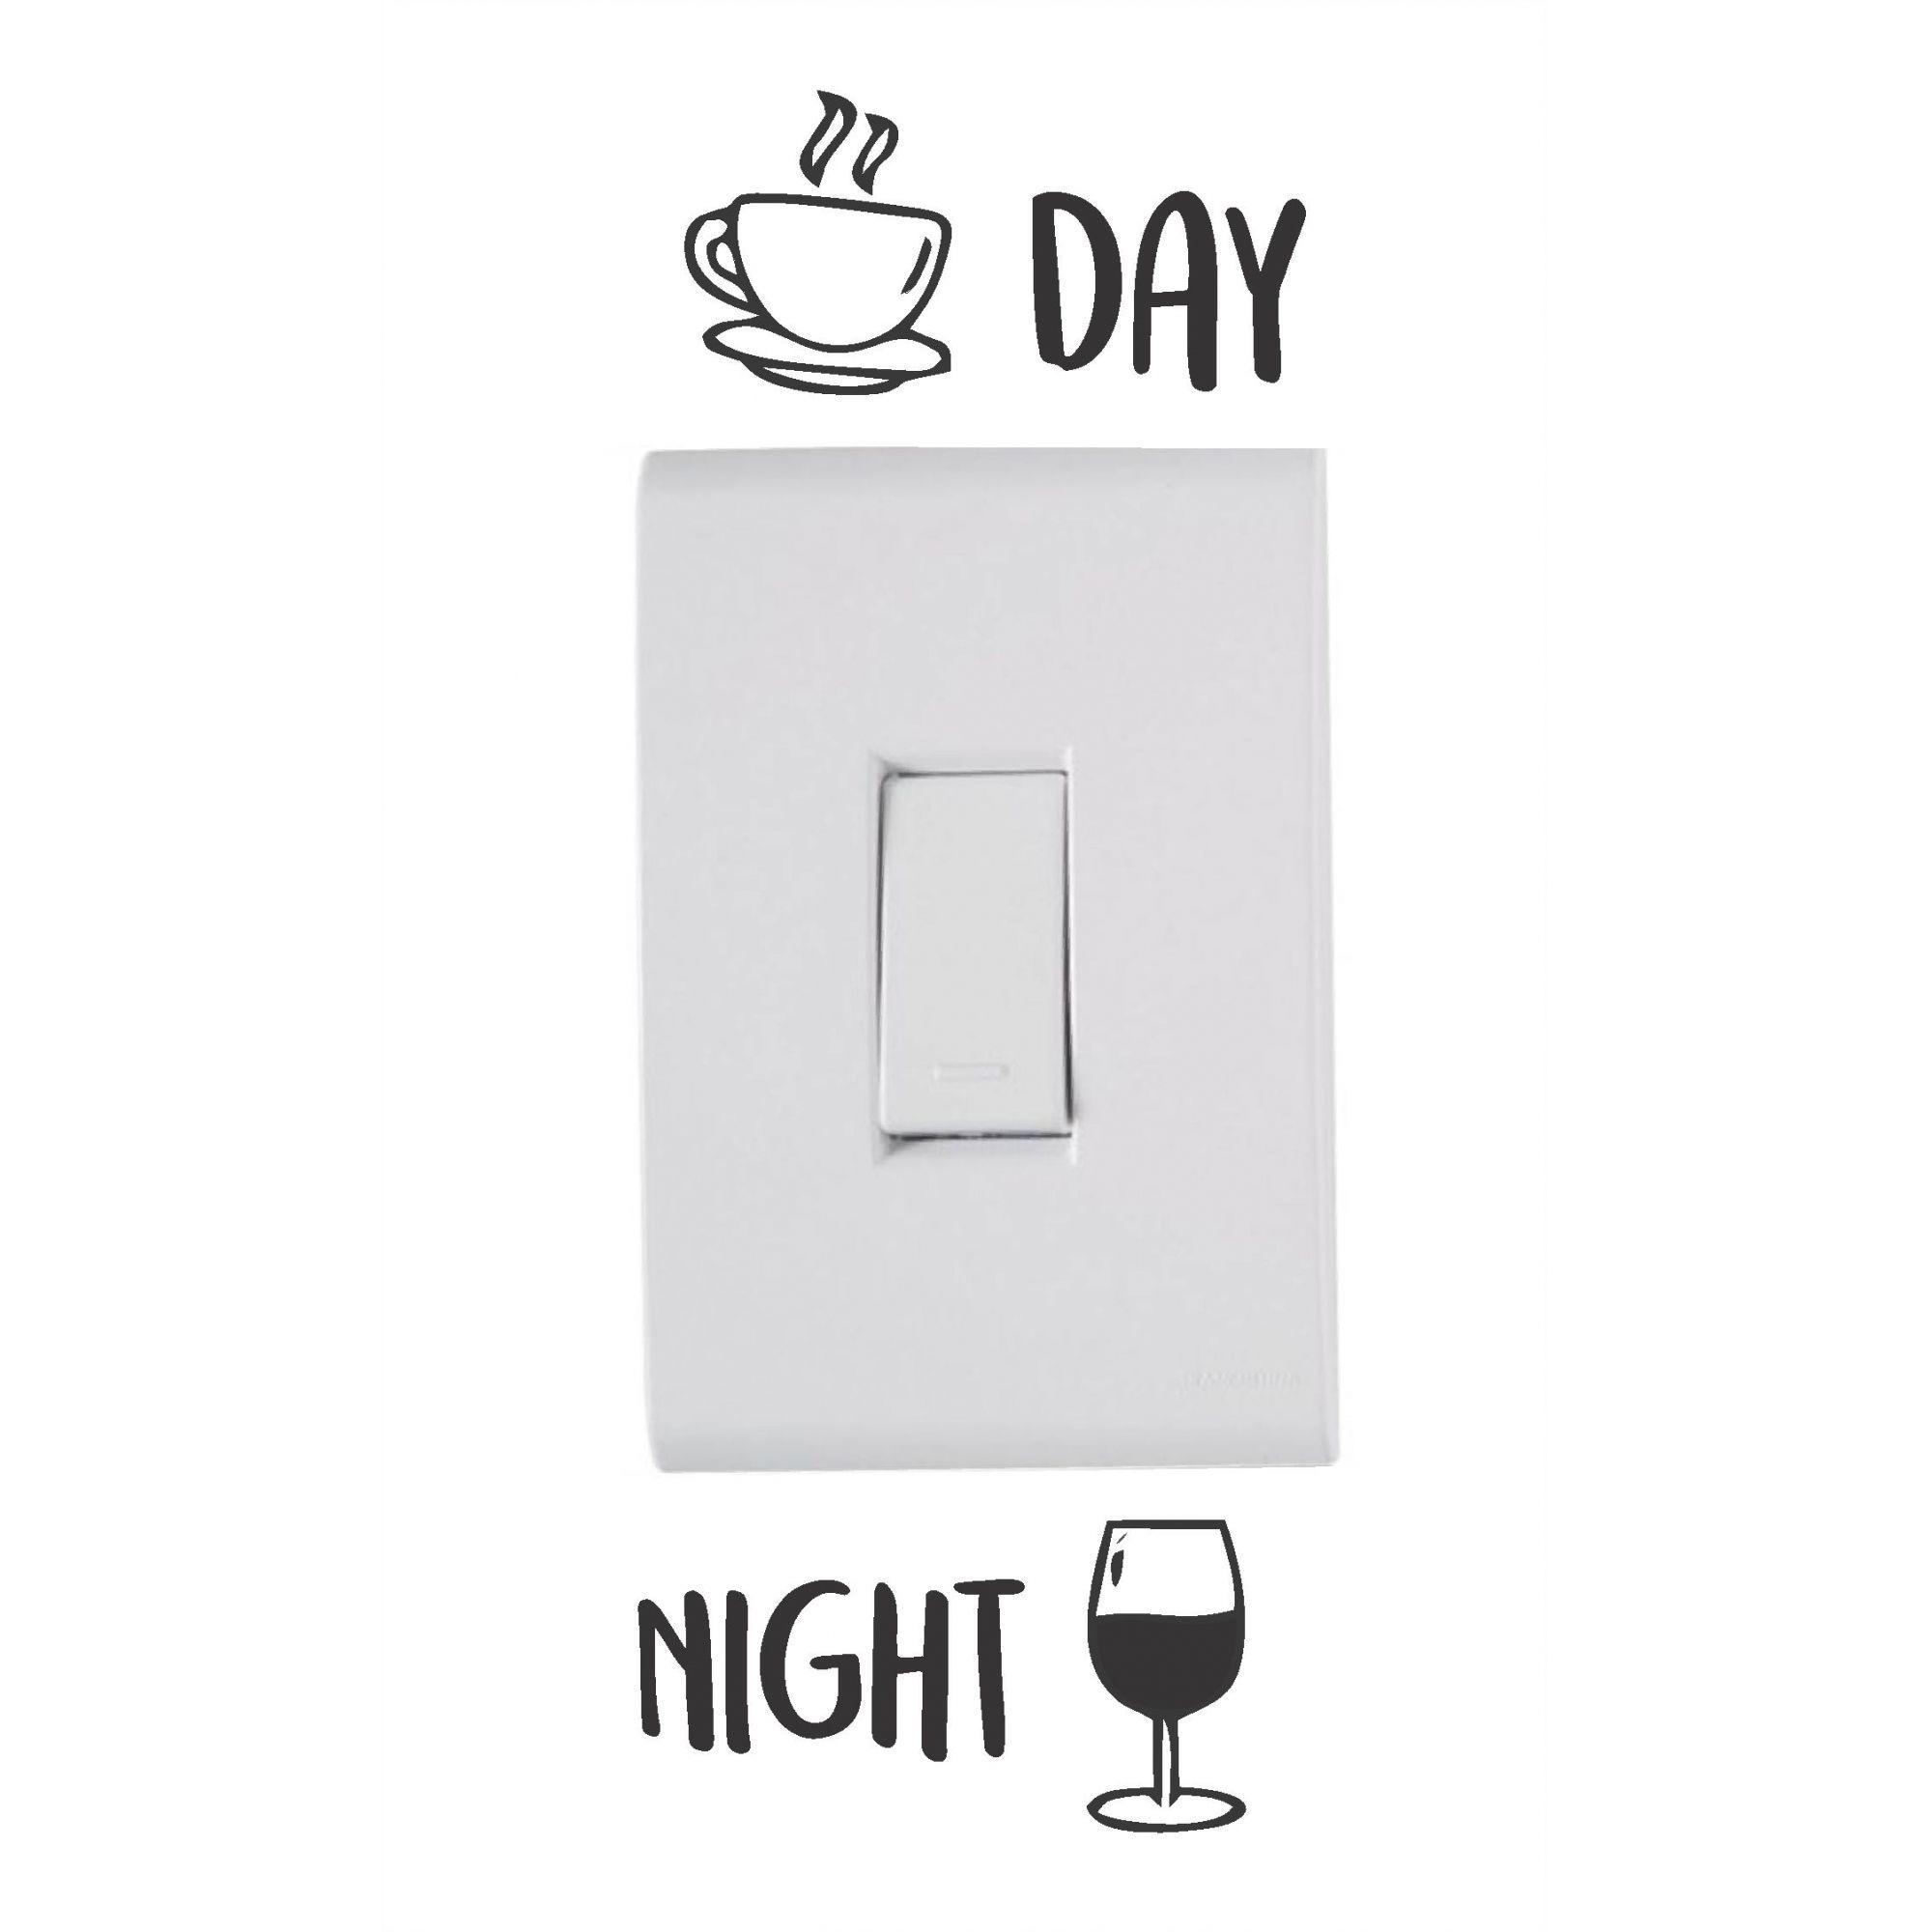 Adesivo de Interruptor e Tomada - Day & Night